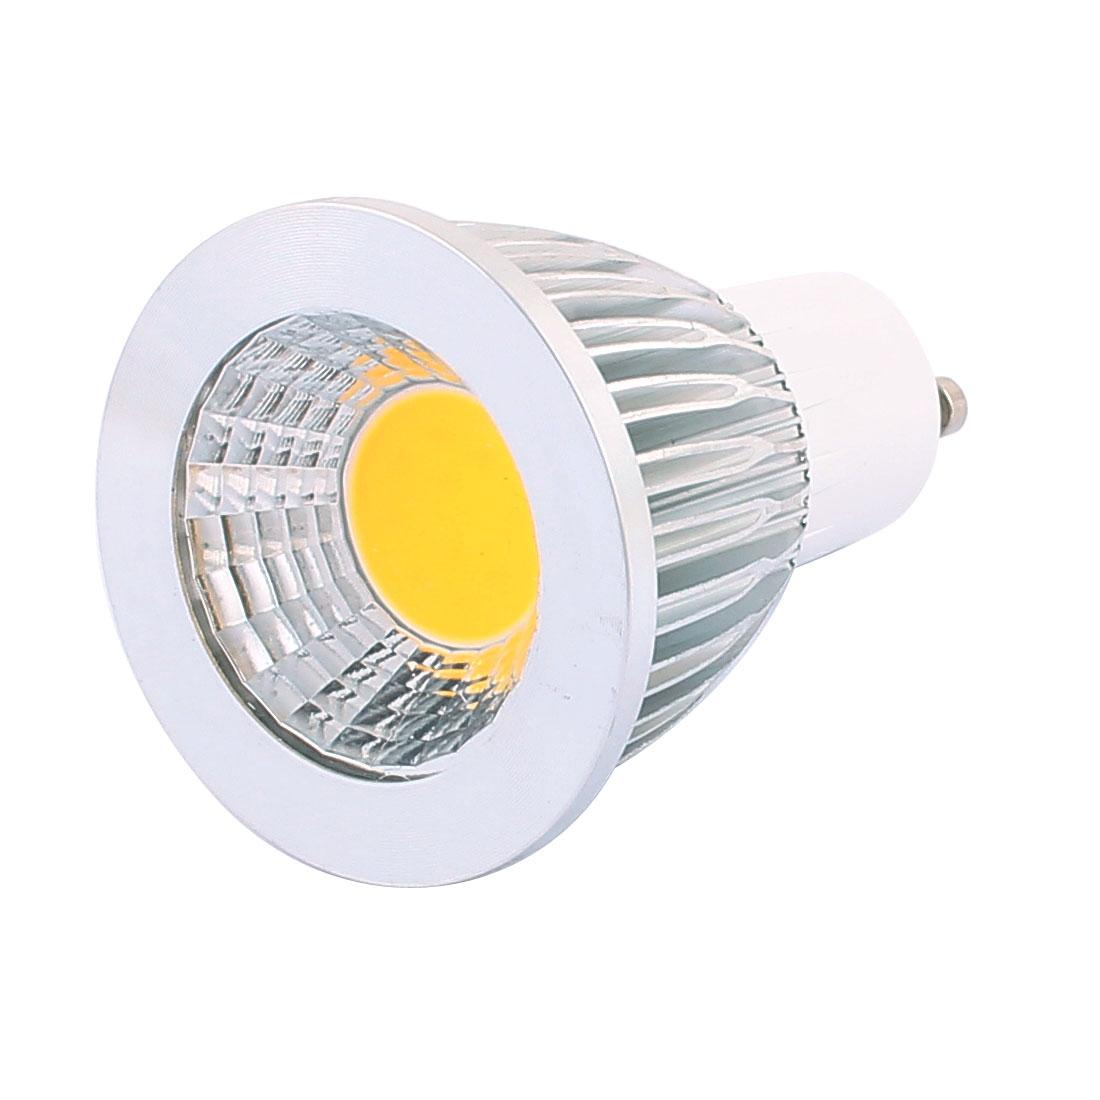 AC85-265V 5W Bright GU10 COB LED Spot Down Light Lamp Energy Saving Pure White